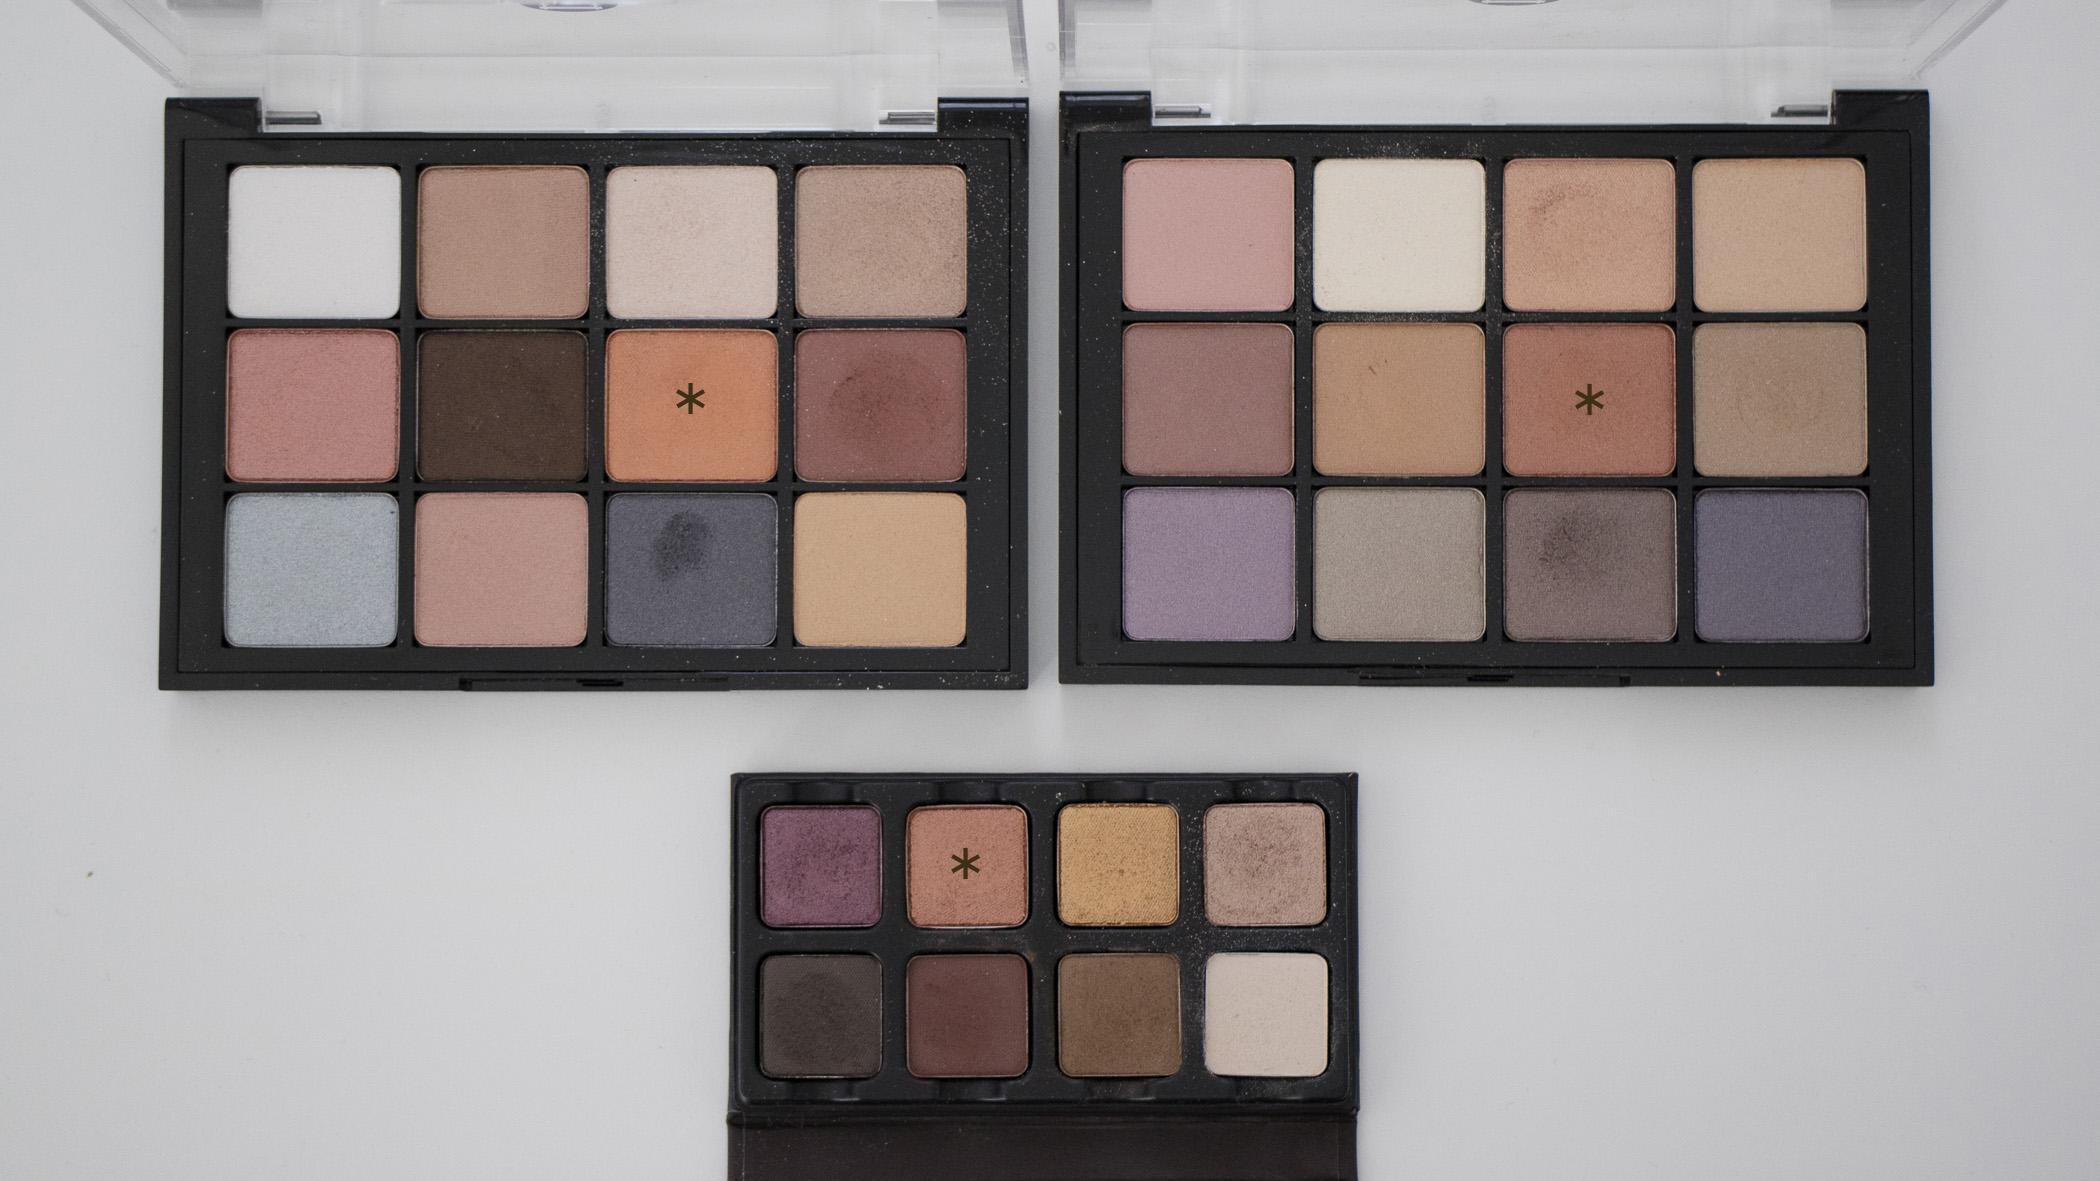 Top Left: Sultry Muse Palette; Top Right: Paris Nudes Palette